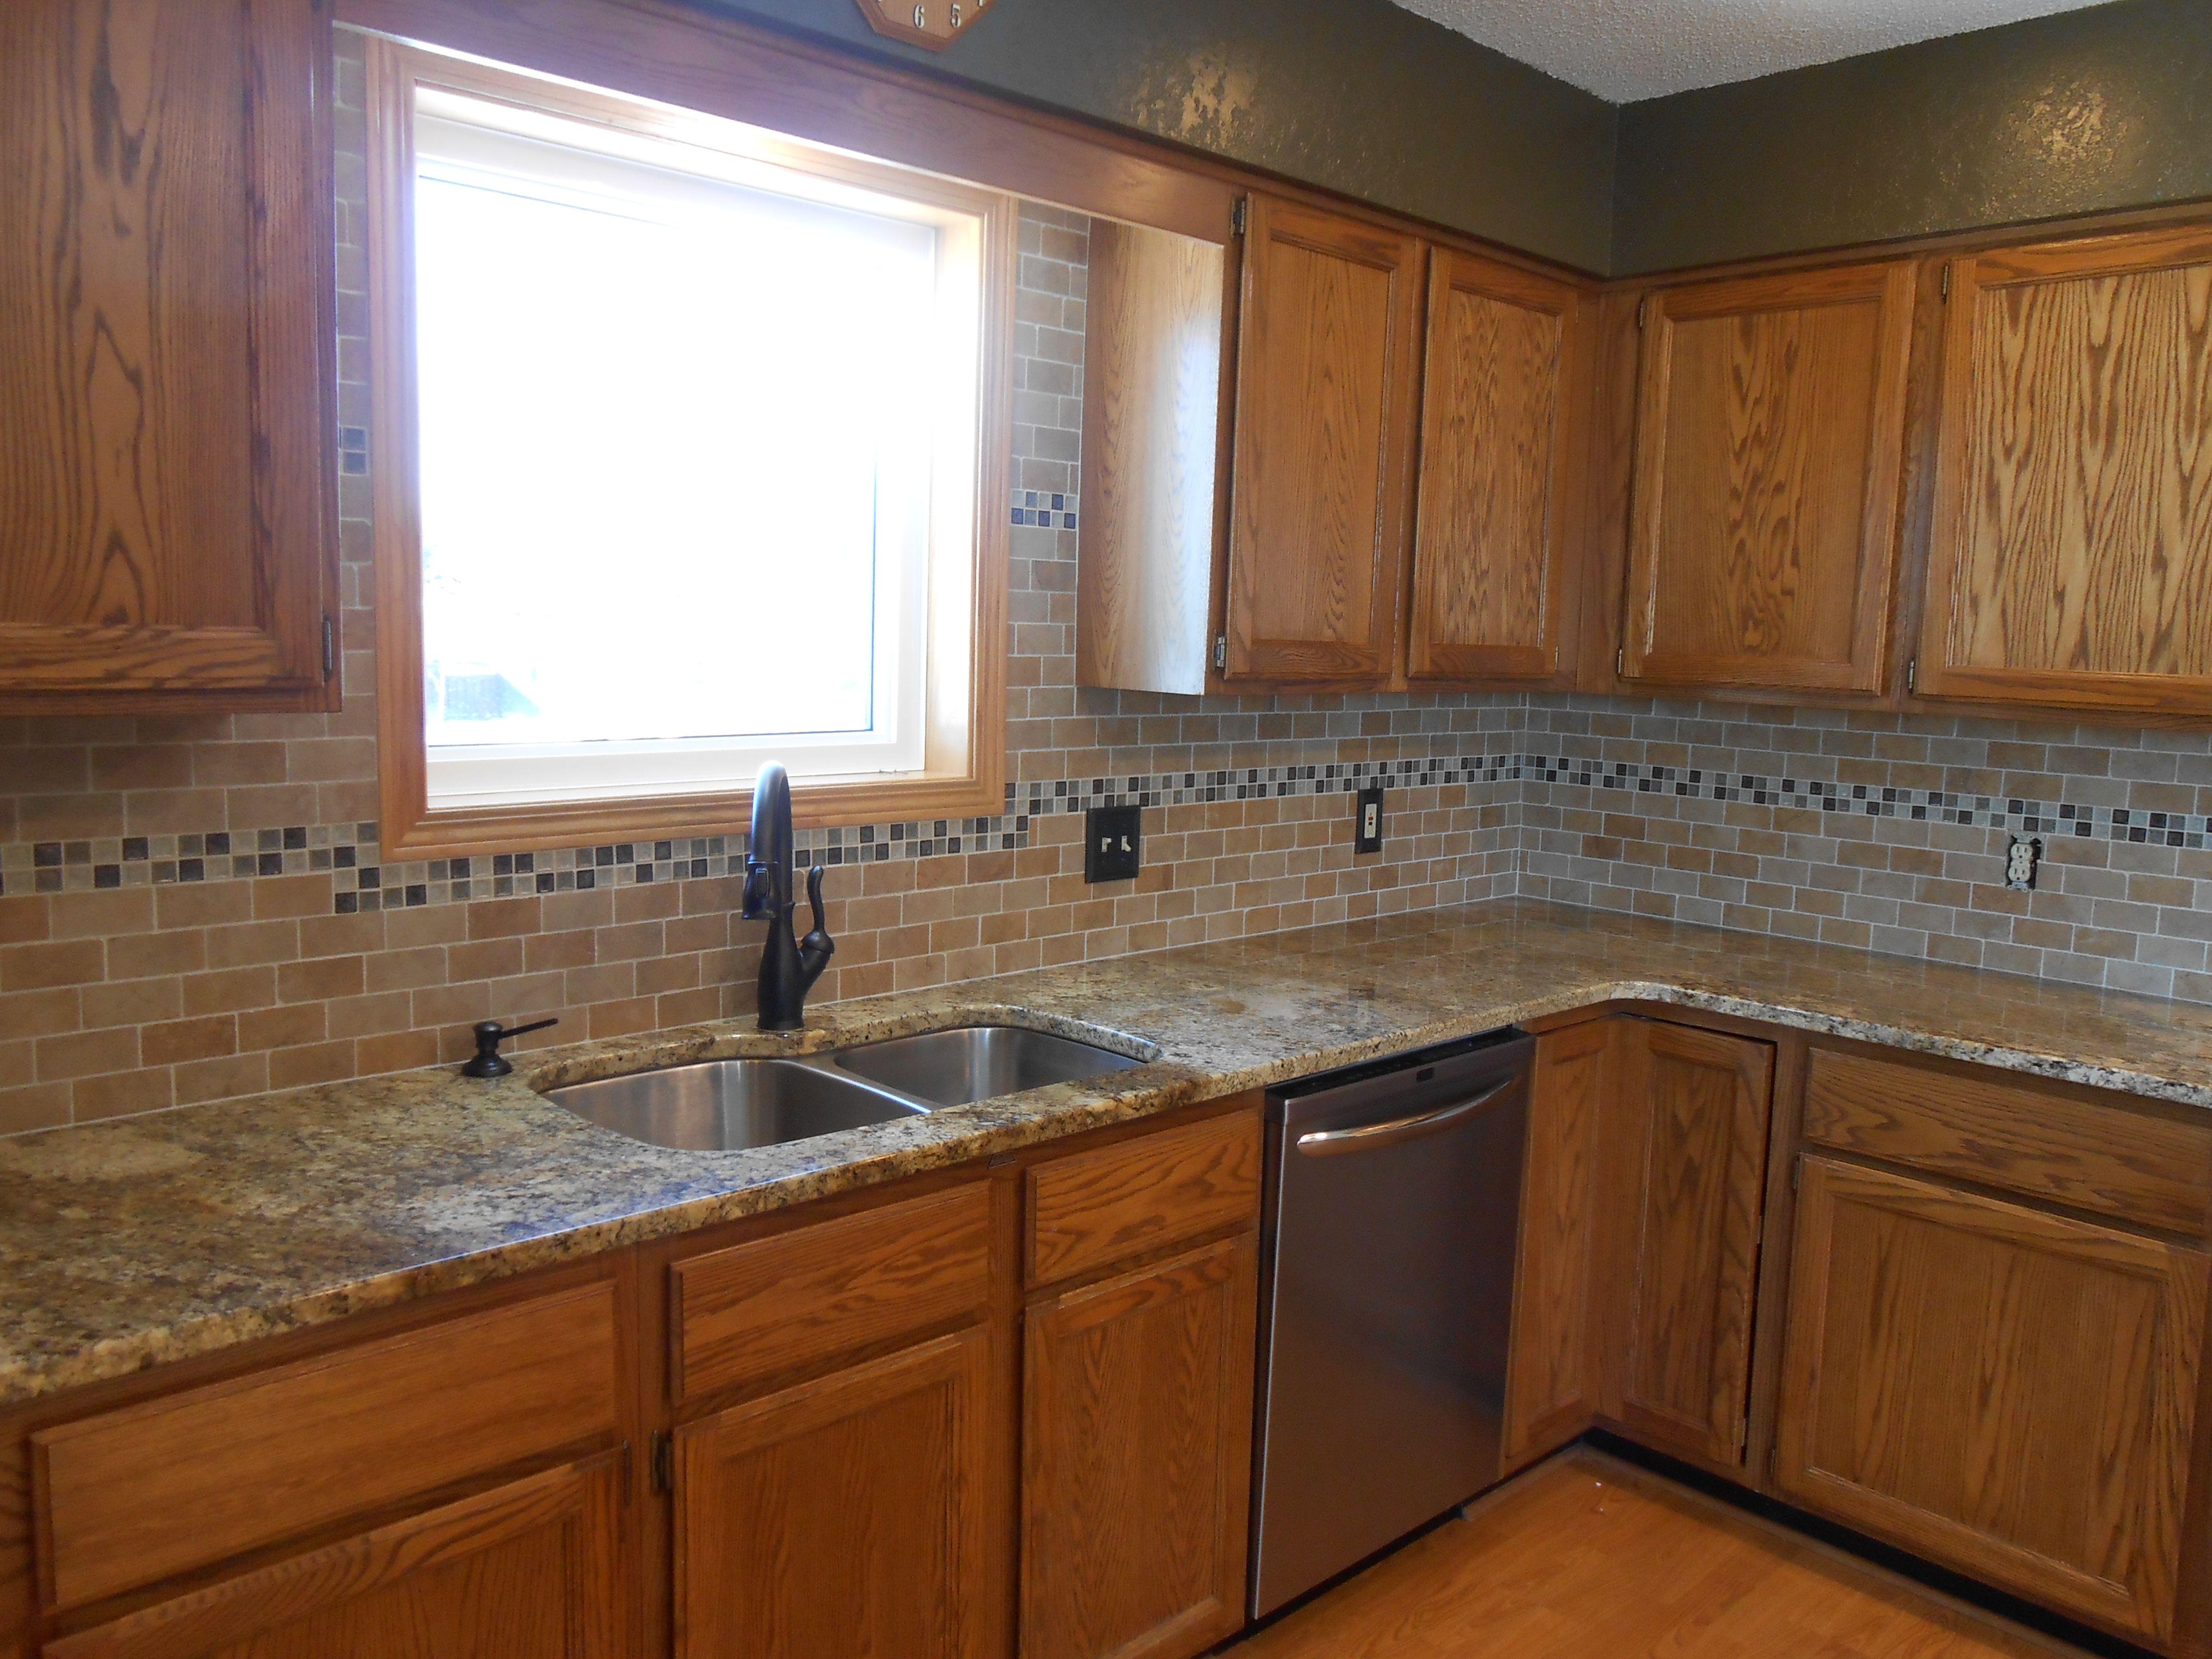 Our Latest Kitchen Backsplash Project Brighter Homes Store In Redwood Falls Mn Kitchen Backsplash Kitchen Kitchen Remodel